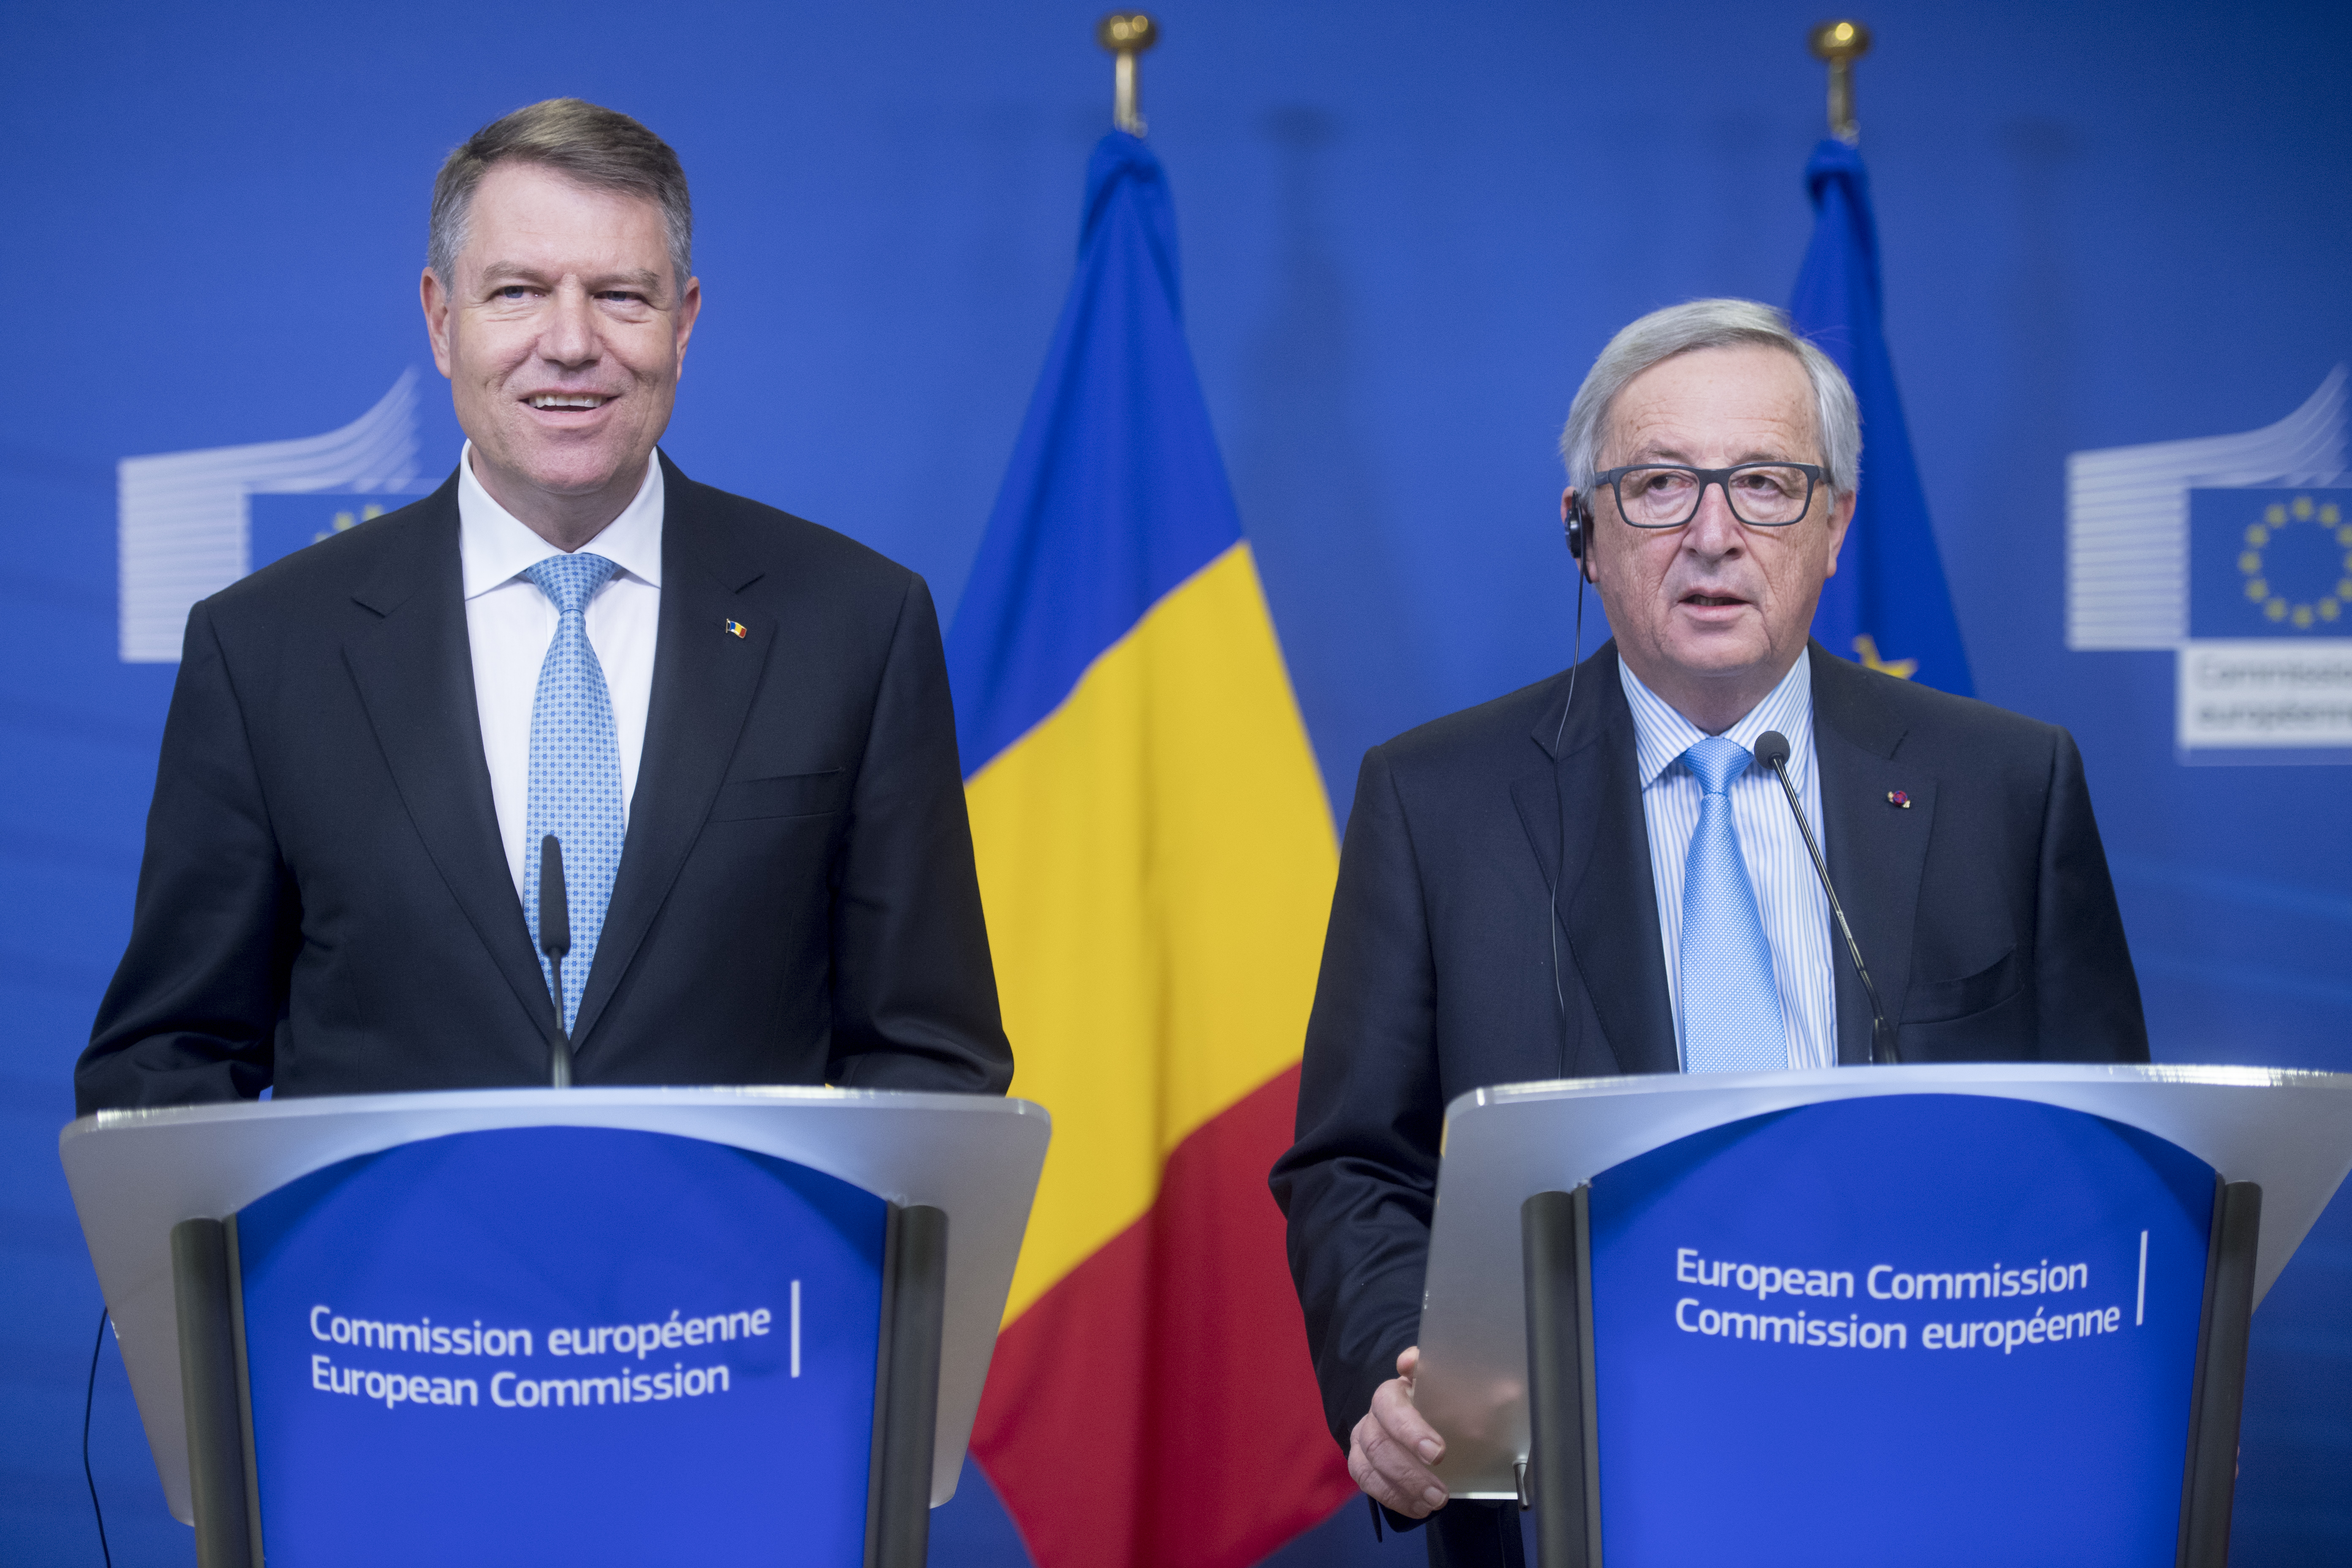 Romania's referendum - a bid to combat corruption